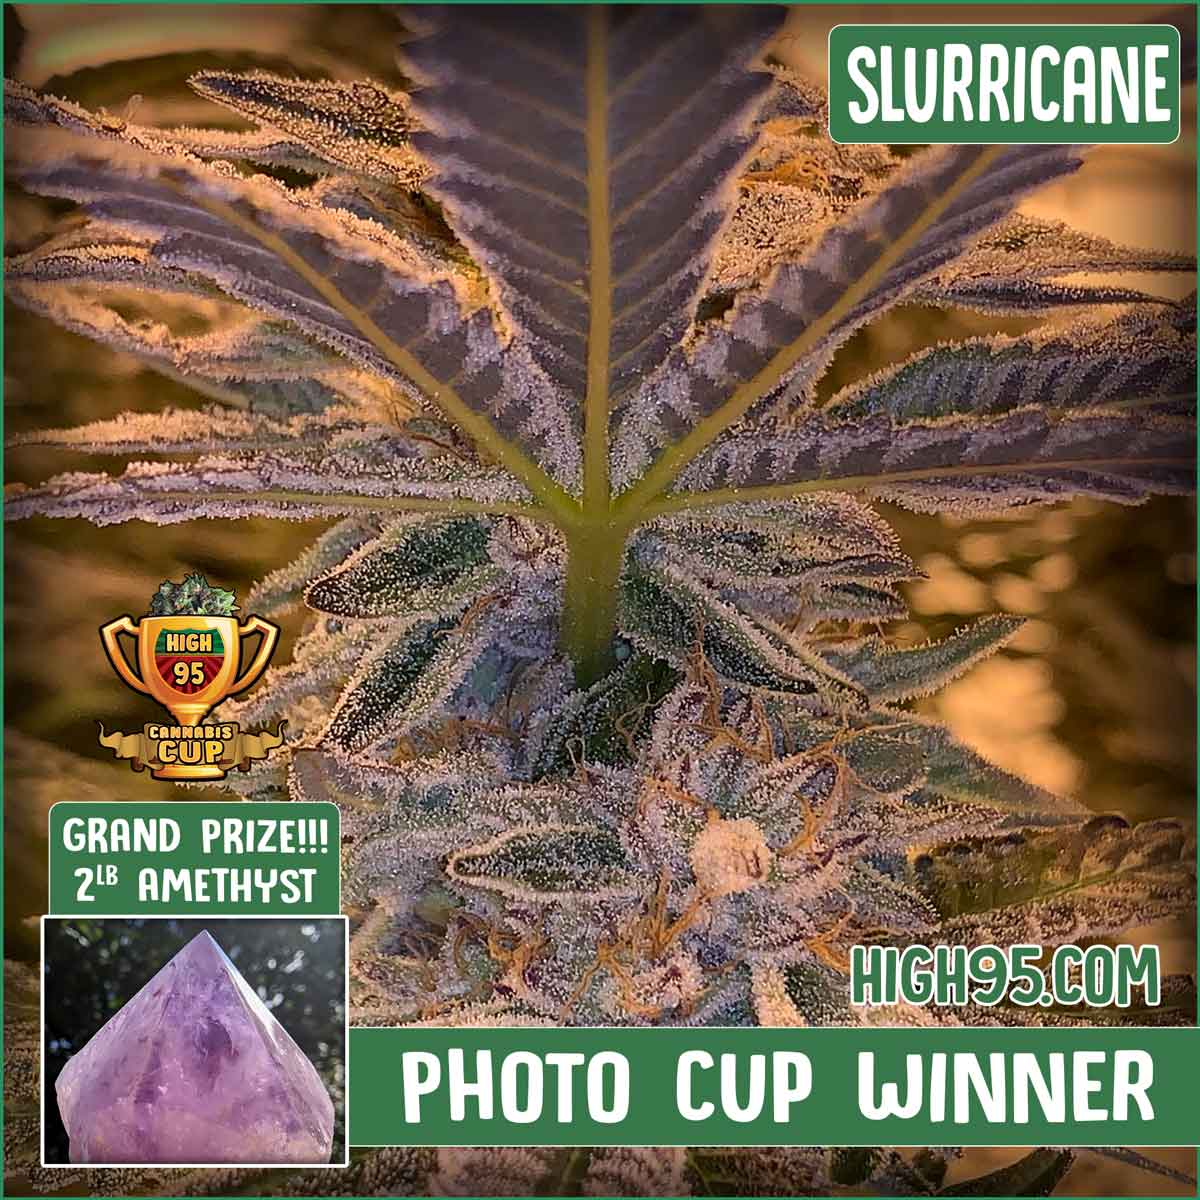 High 95 Photo Cup Winner!